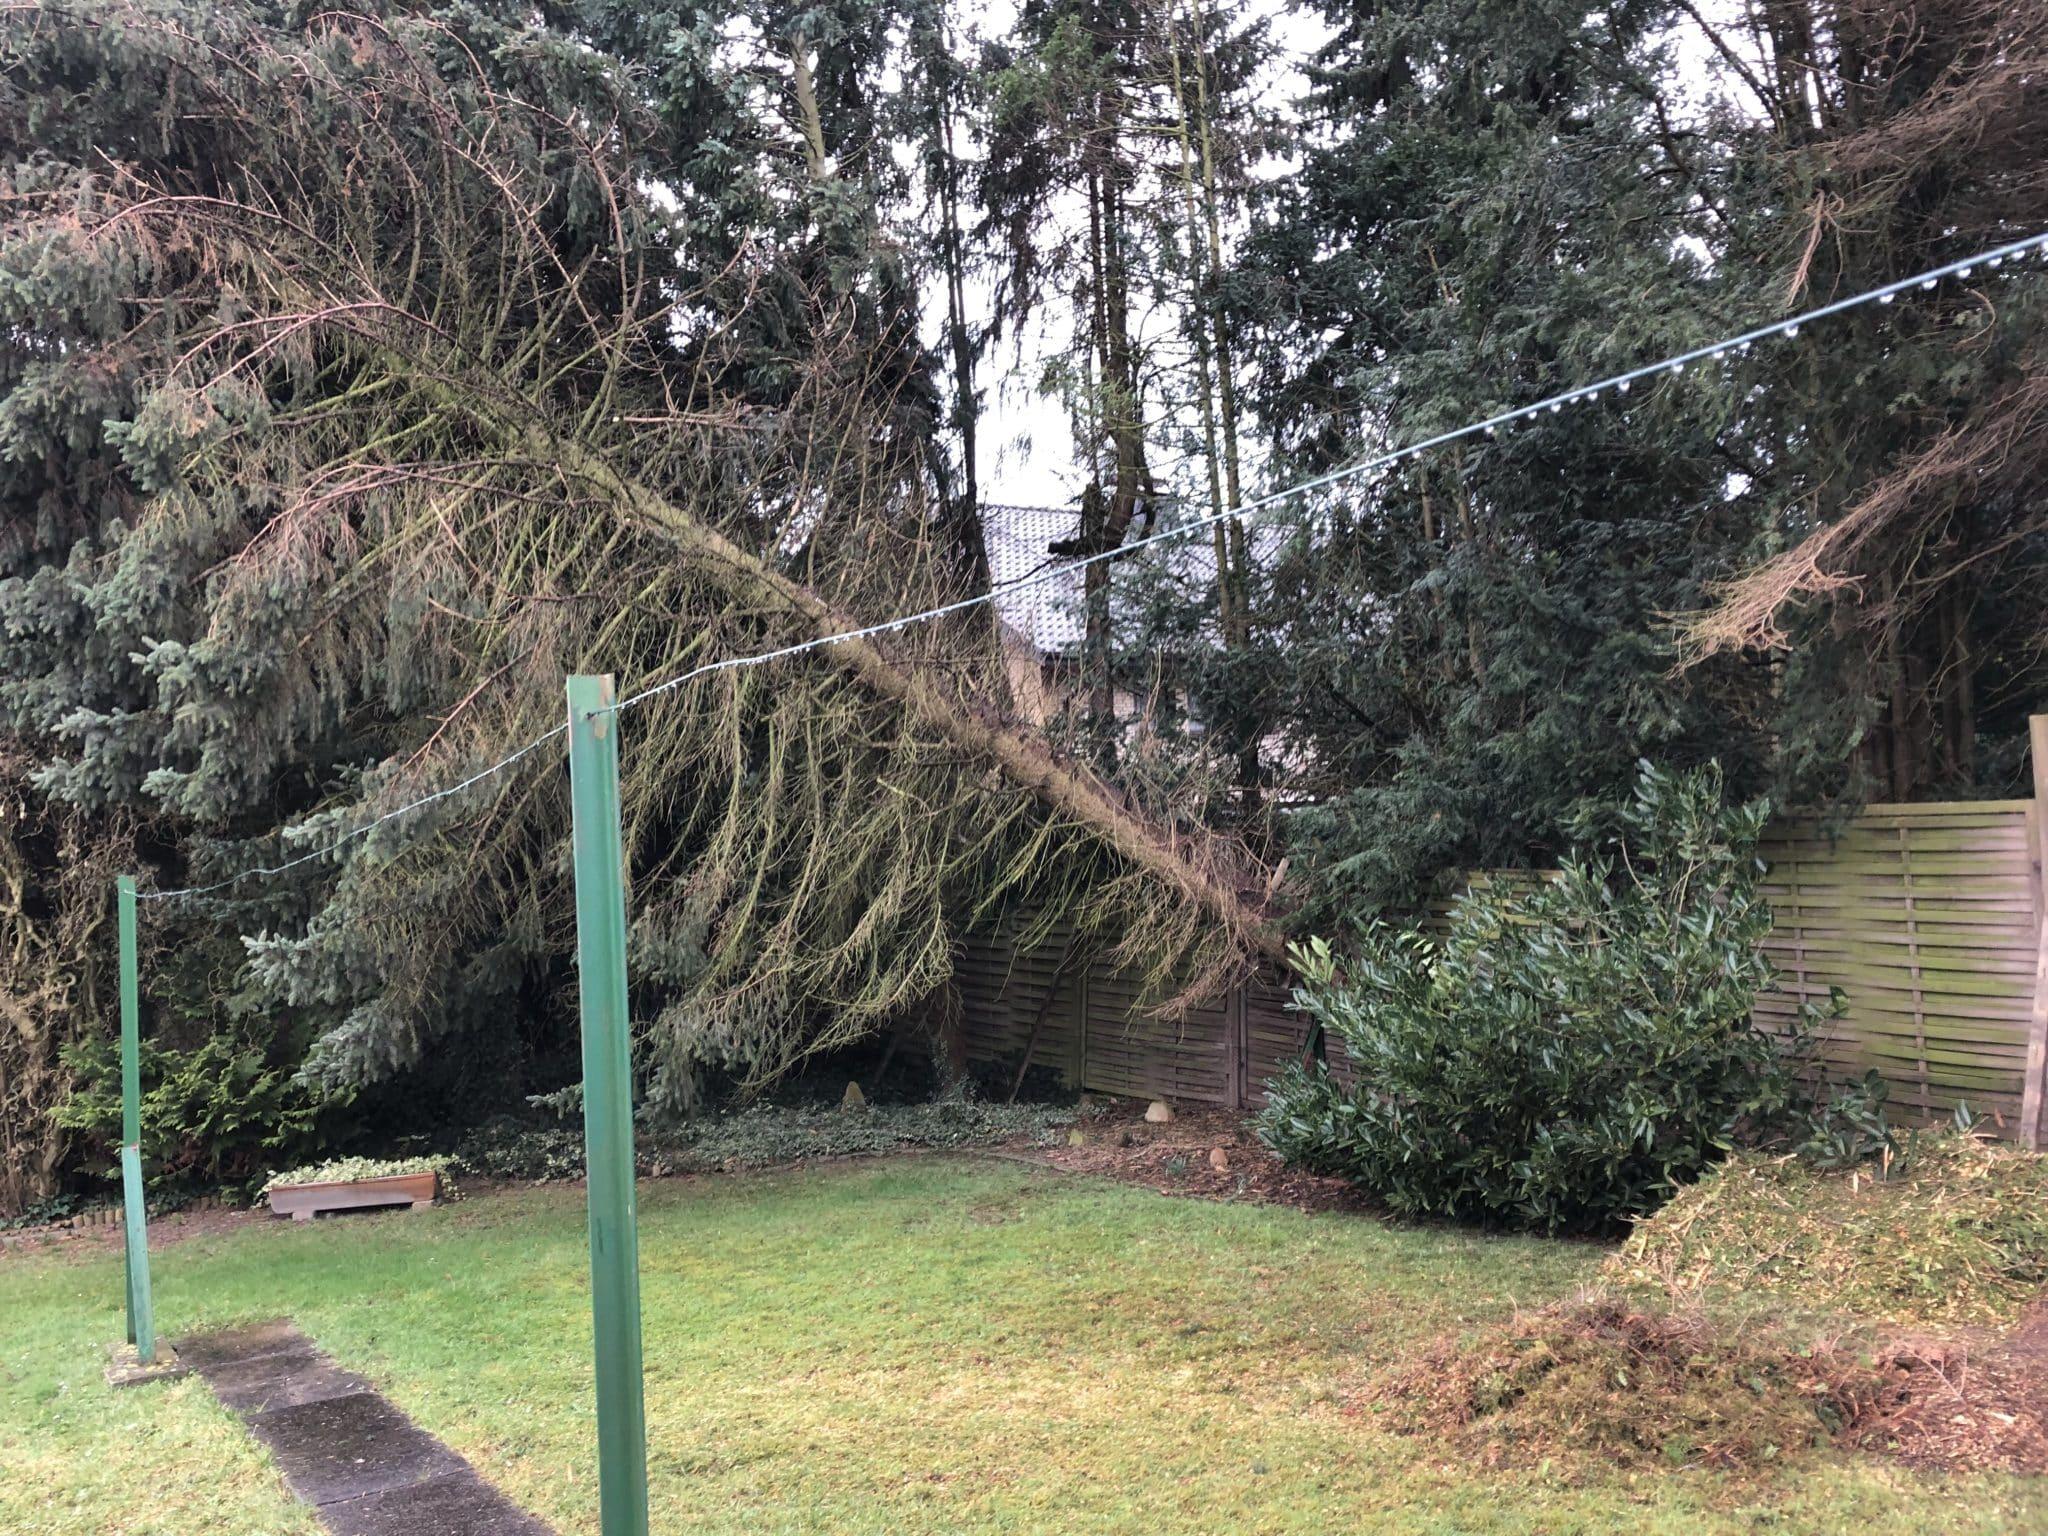 Baumfällung nach Sturmschaden Bad Oeynhausen